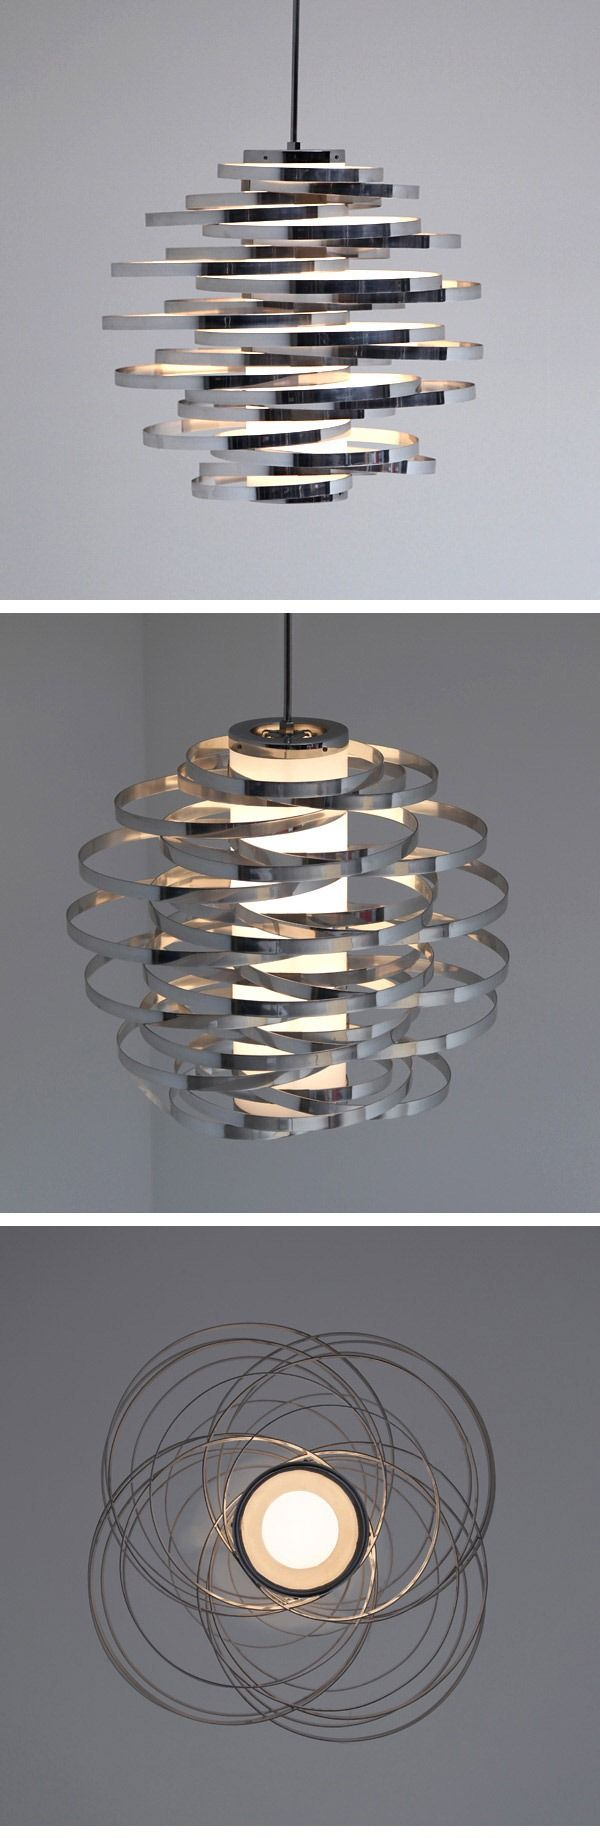 stunning gaetano sciolari chandelier light pinterest beleuchtung lampen und design lampen. Black Bedroom Furniture Sets. Home Design Ideas